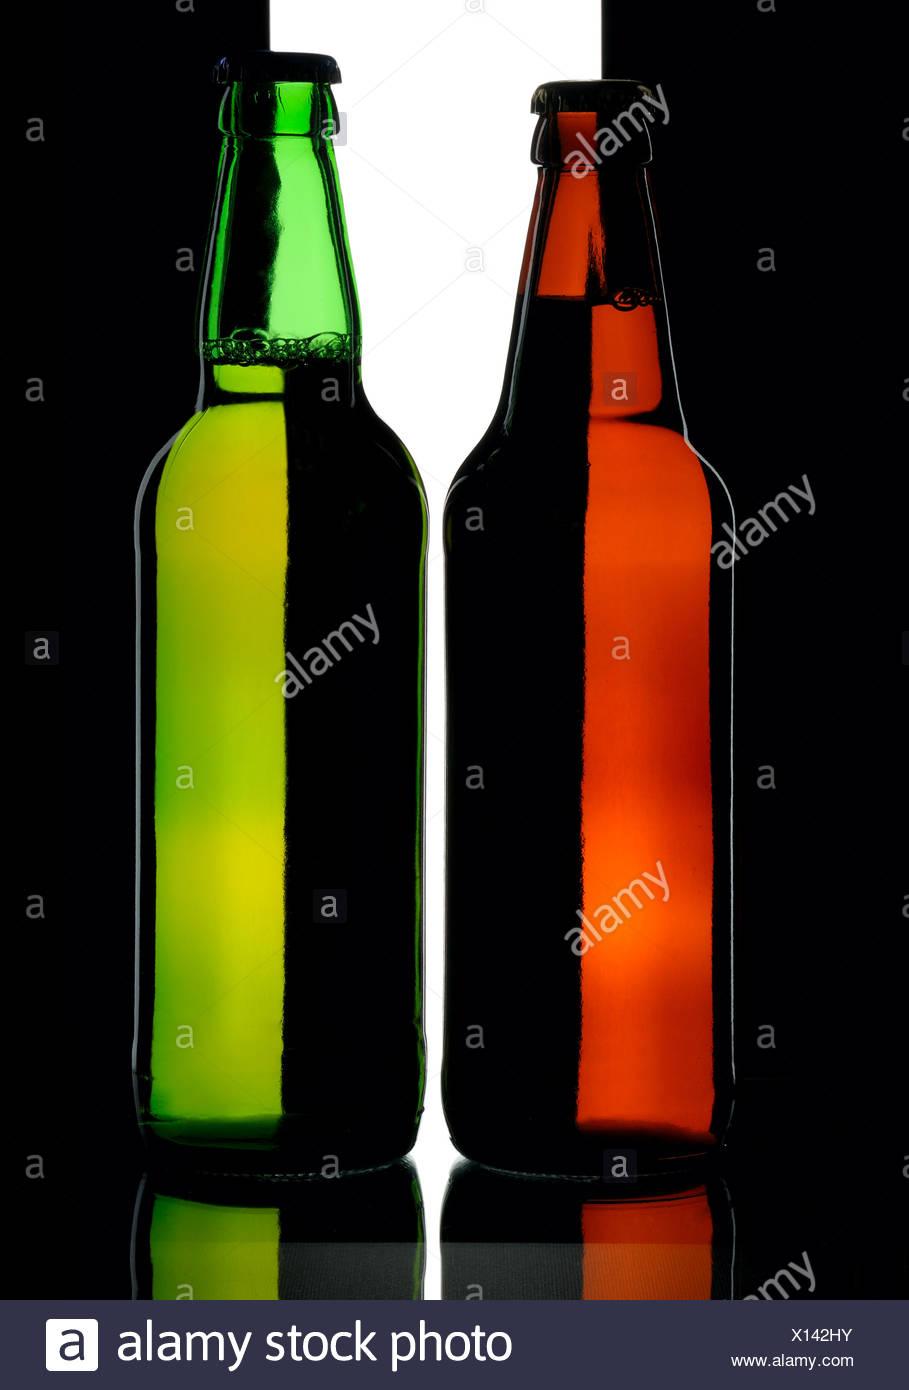 Bottles of beer - Stock Image